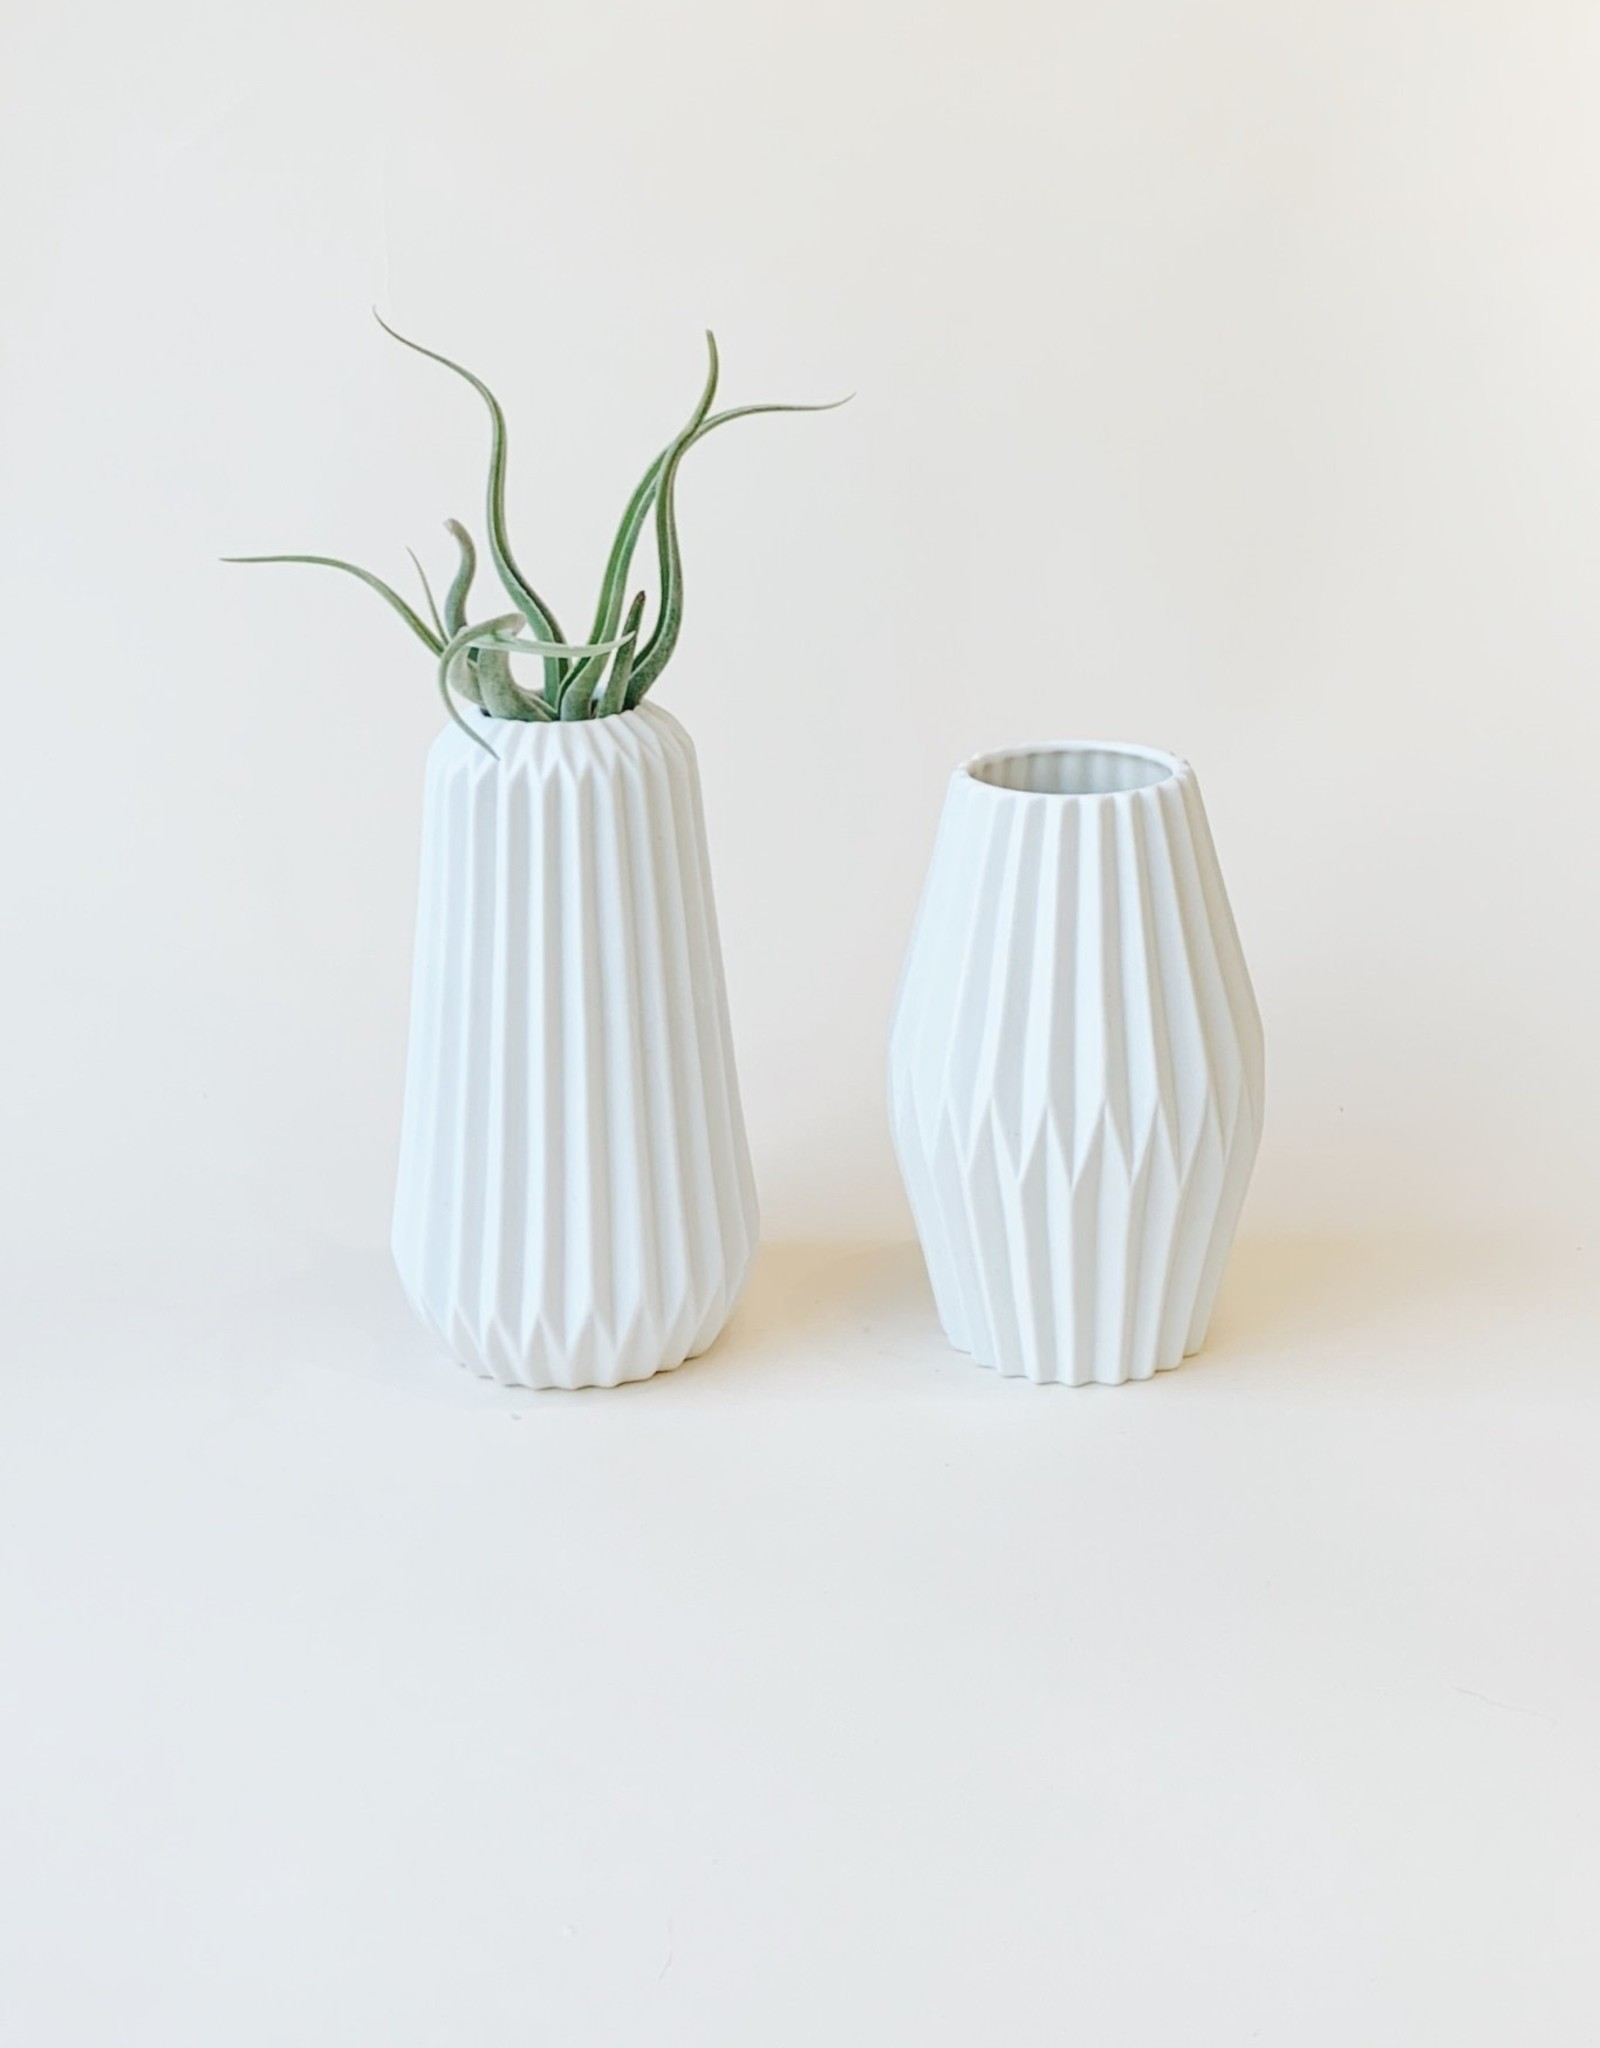 White Pleated Ceramic Vase (Two Styles)